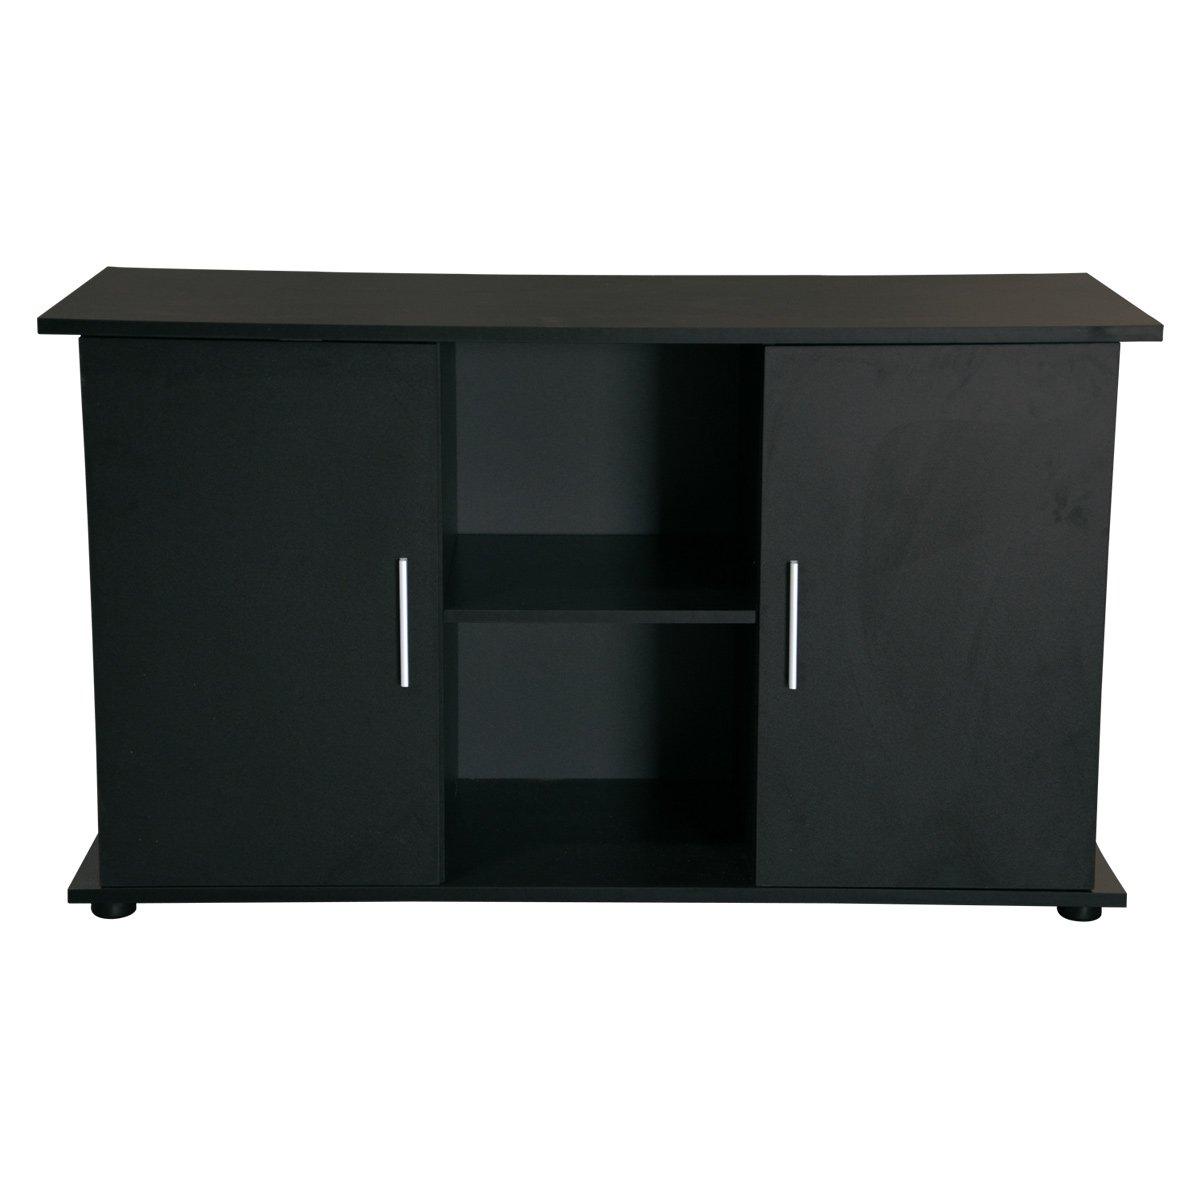 Seapora 52019 Empress Cabinet Stand, 48'' x 18'', Black